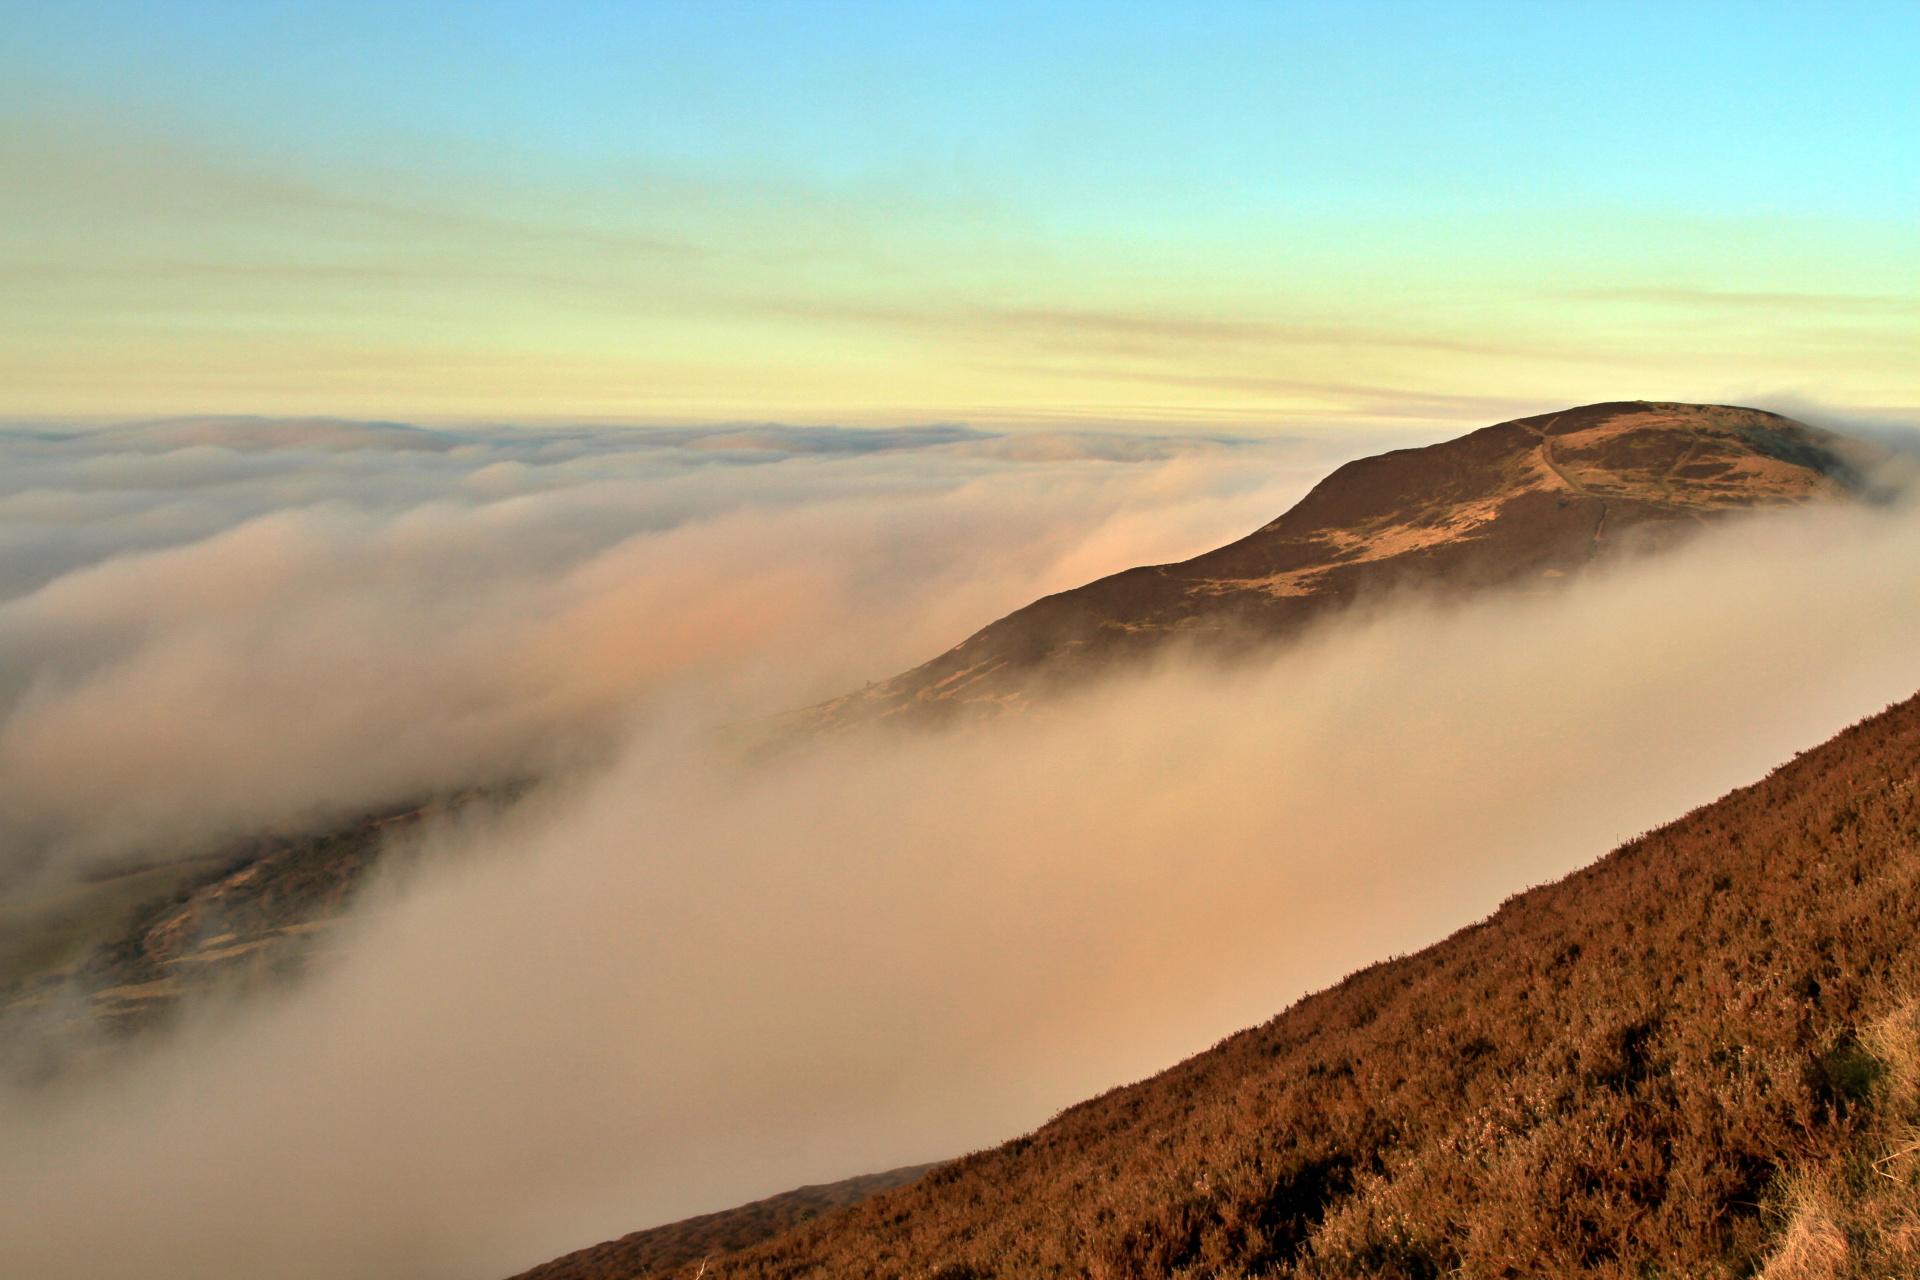 Eildon hills